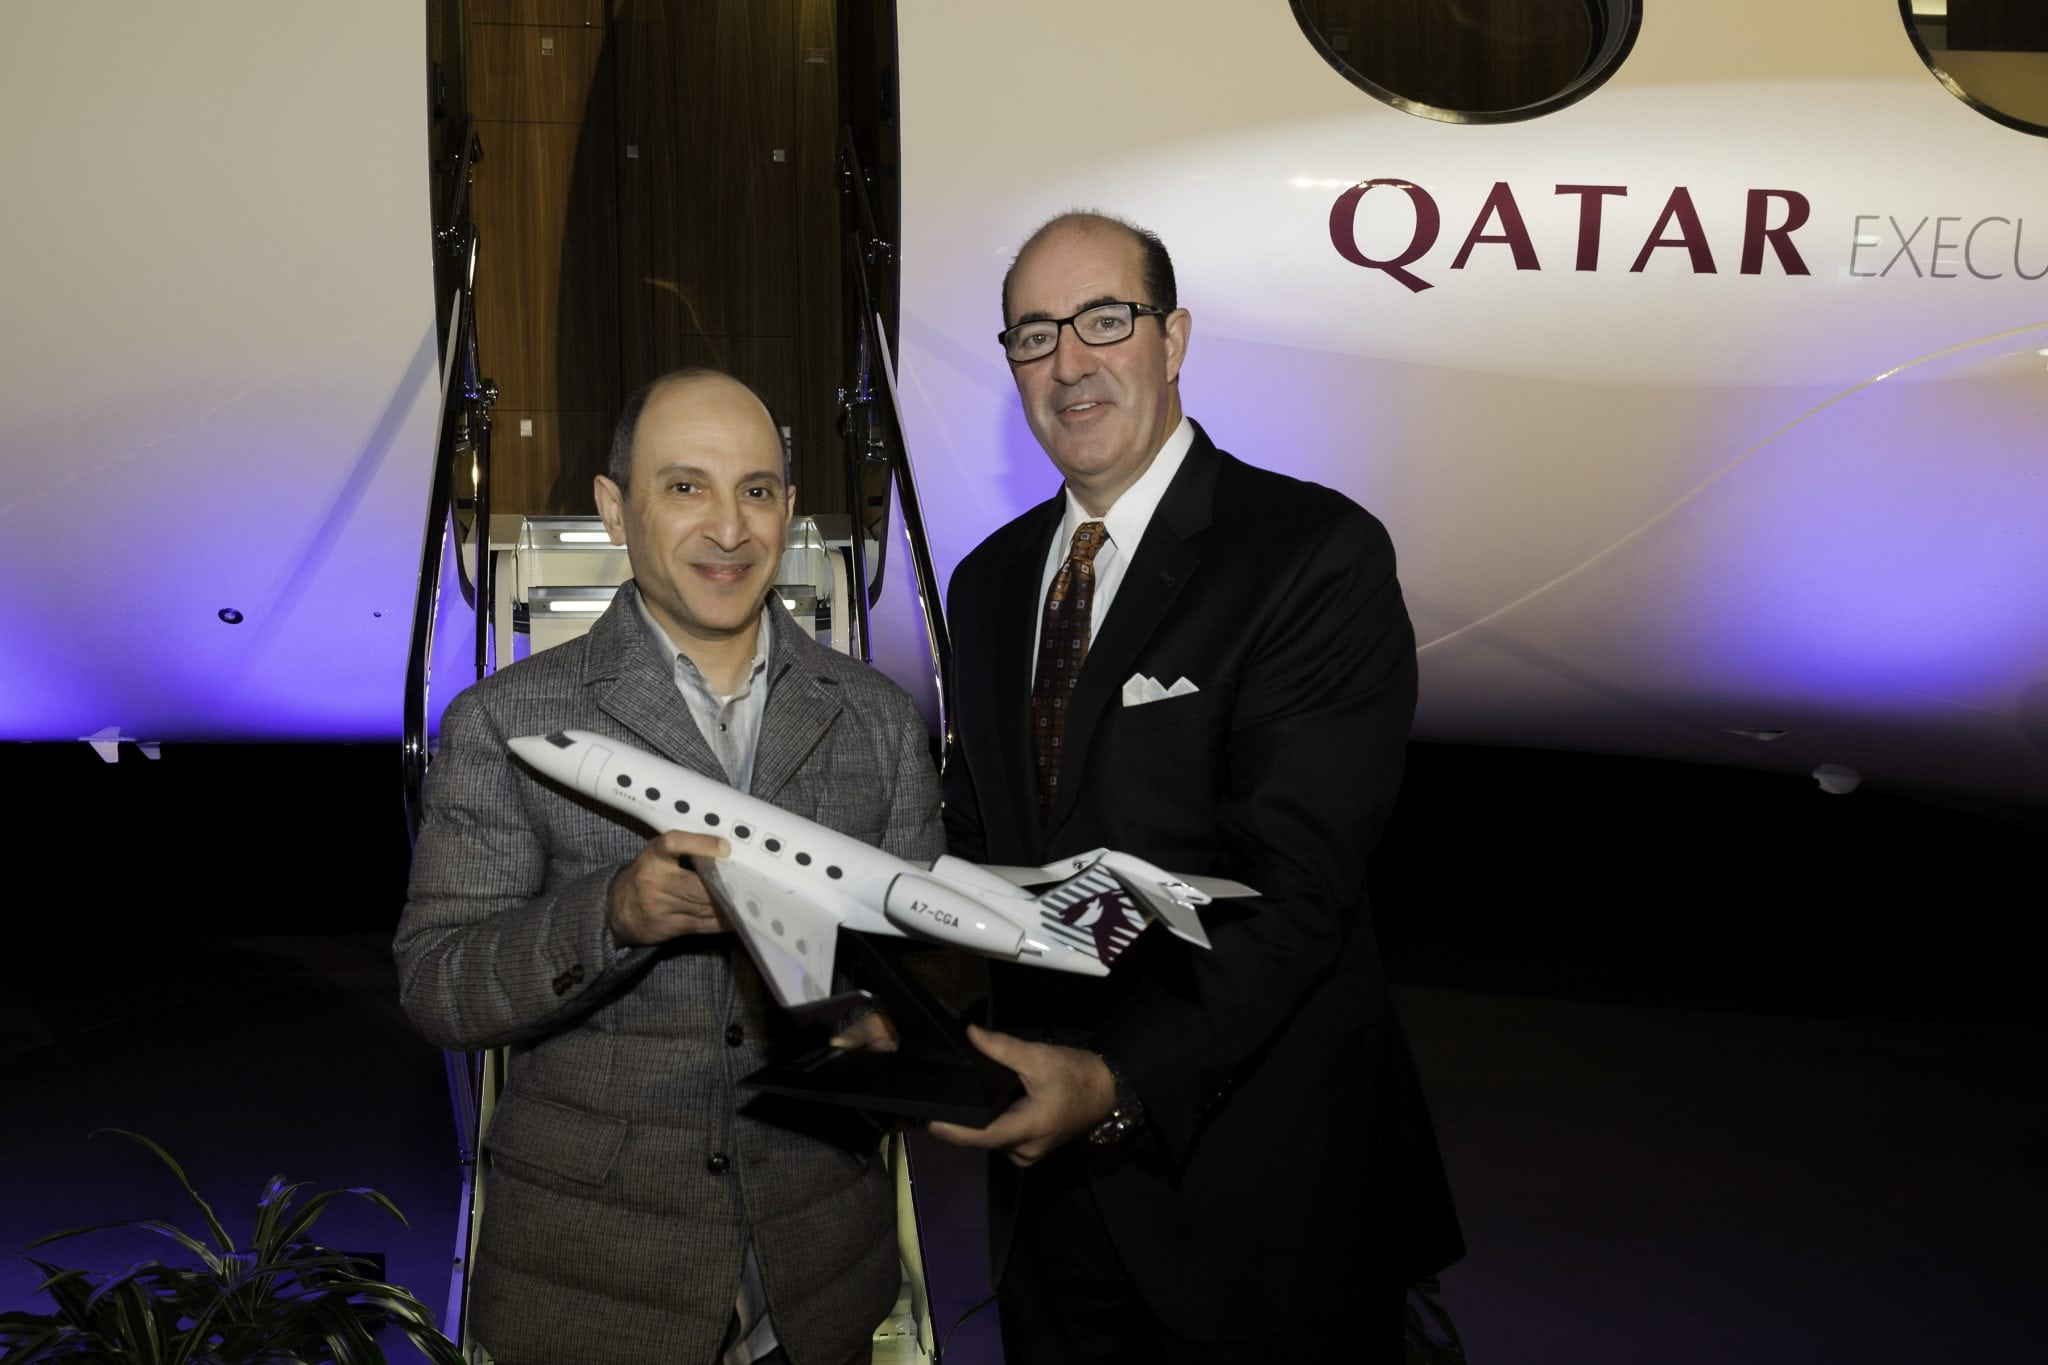 Qatar Airways Group Chief Executive Akbar Al Bakerreceives an aircraft model fromMark Burns, president, Gulfstream